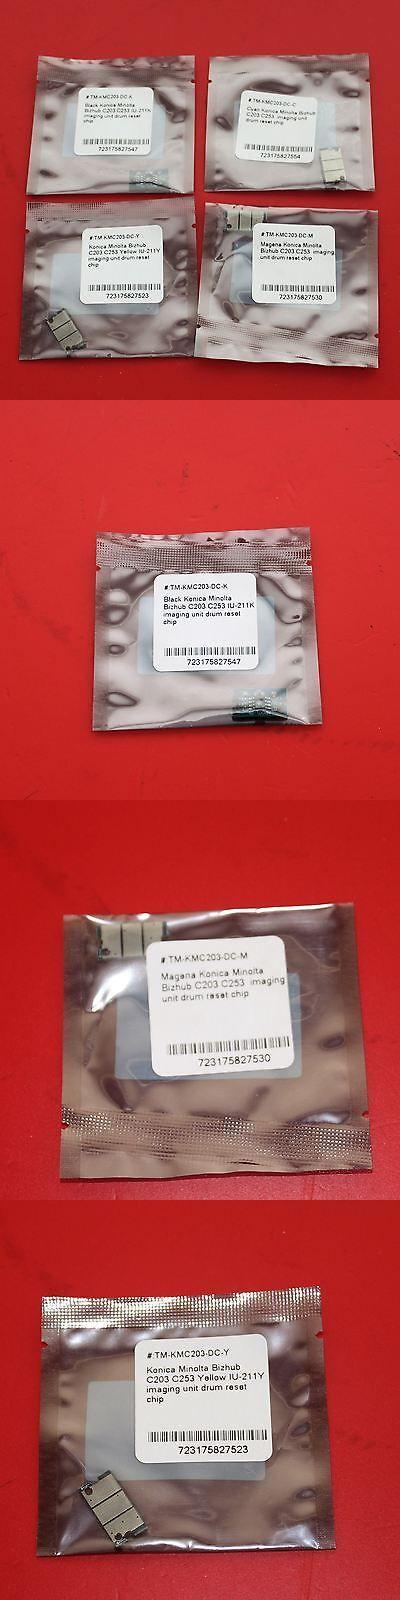 Details About 1 Set 4 Drum Reset Chips For Konica Minolta Bizhub